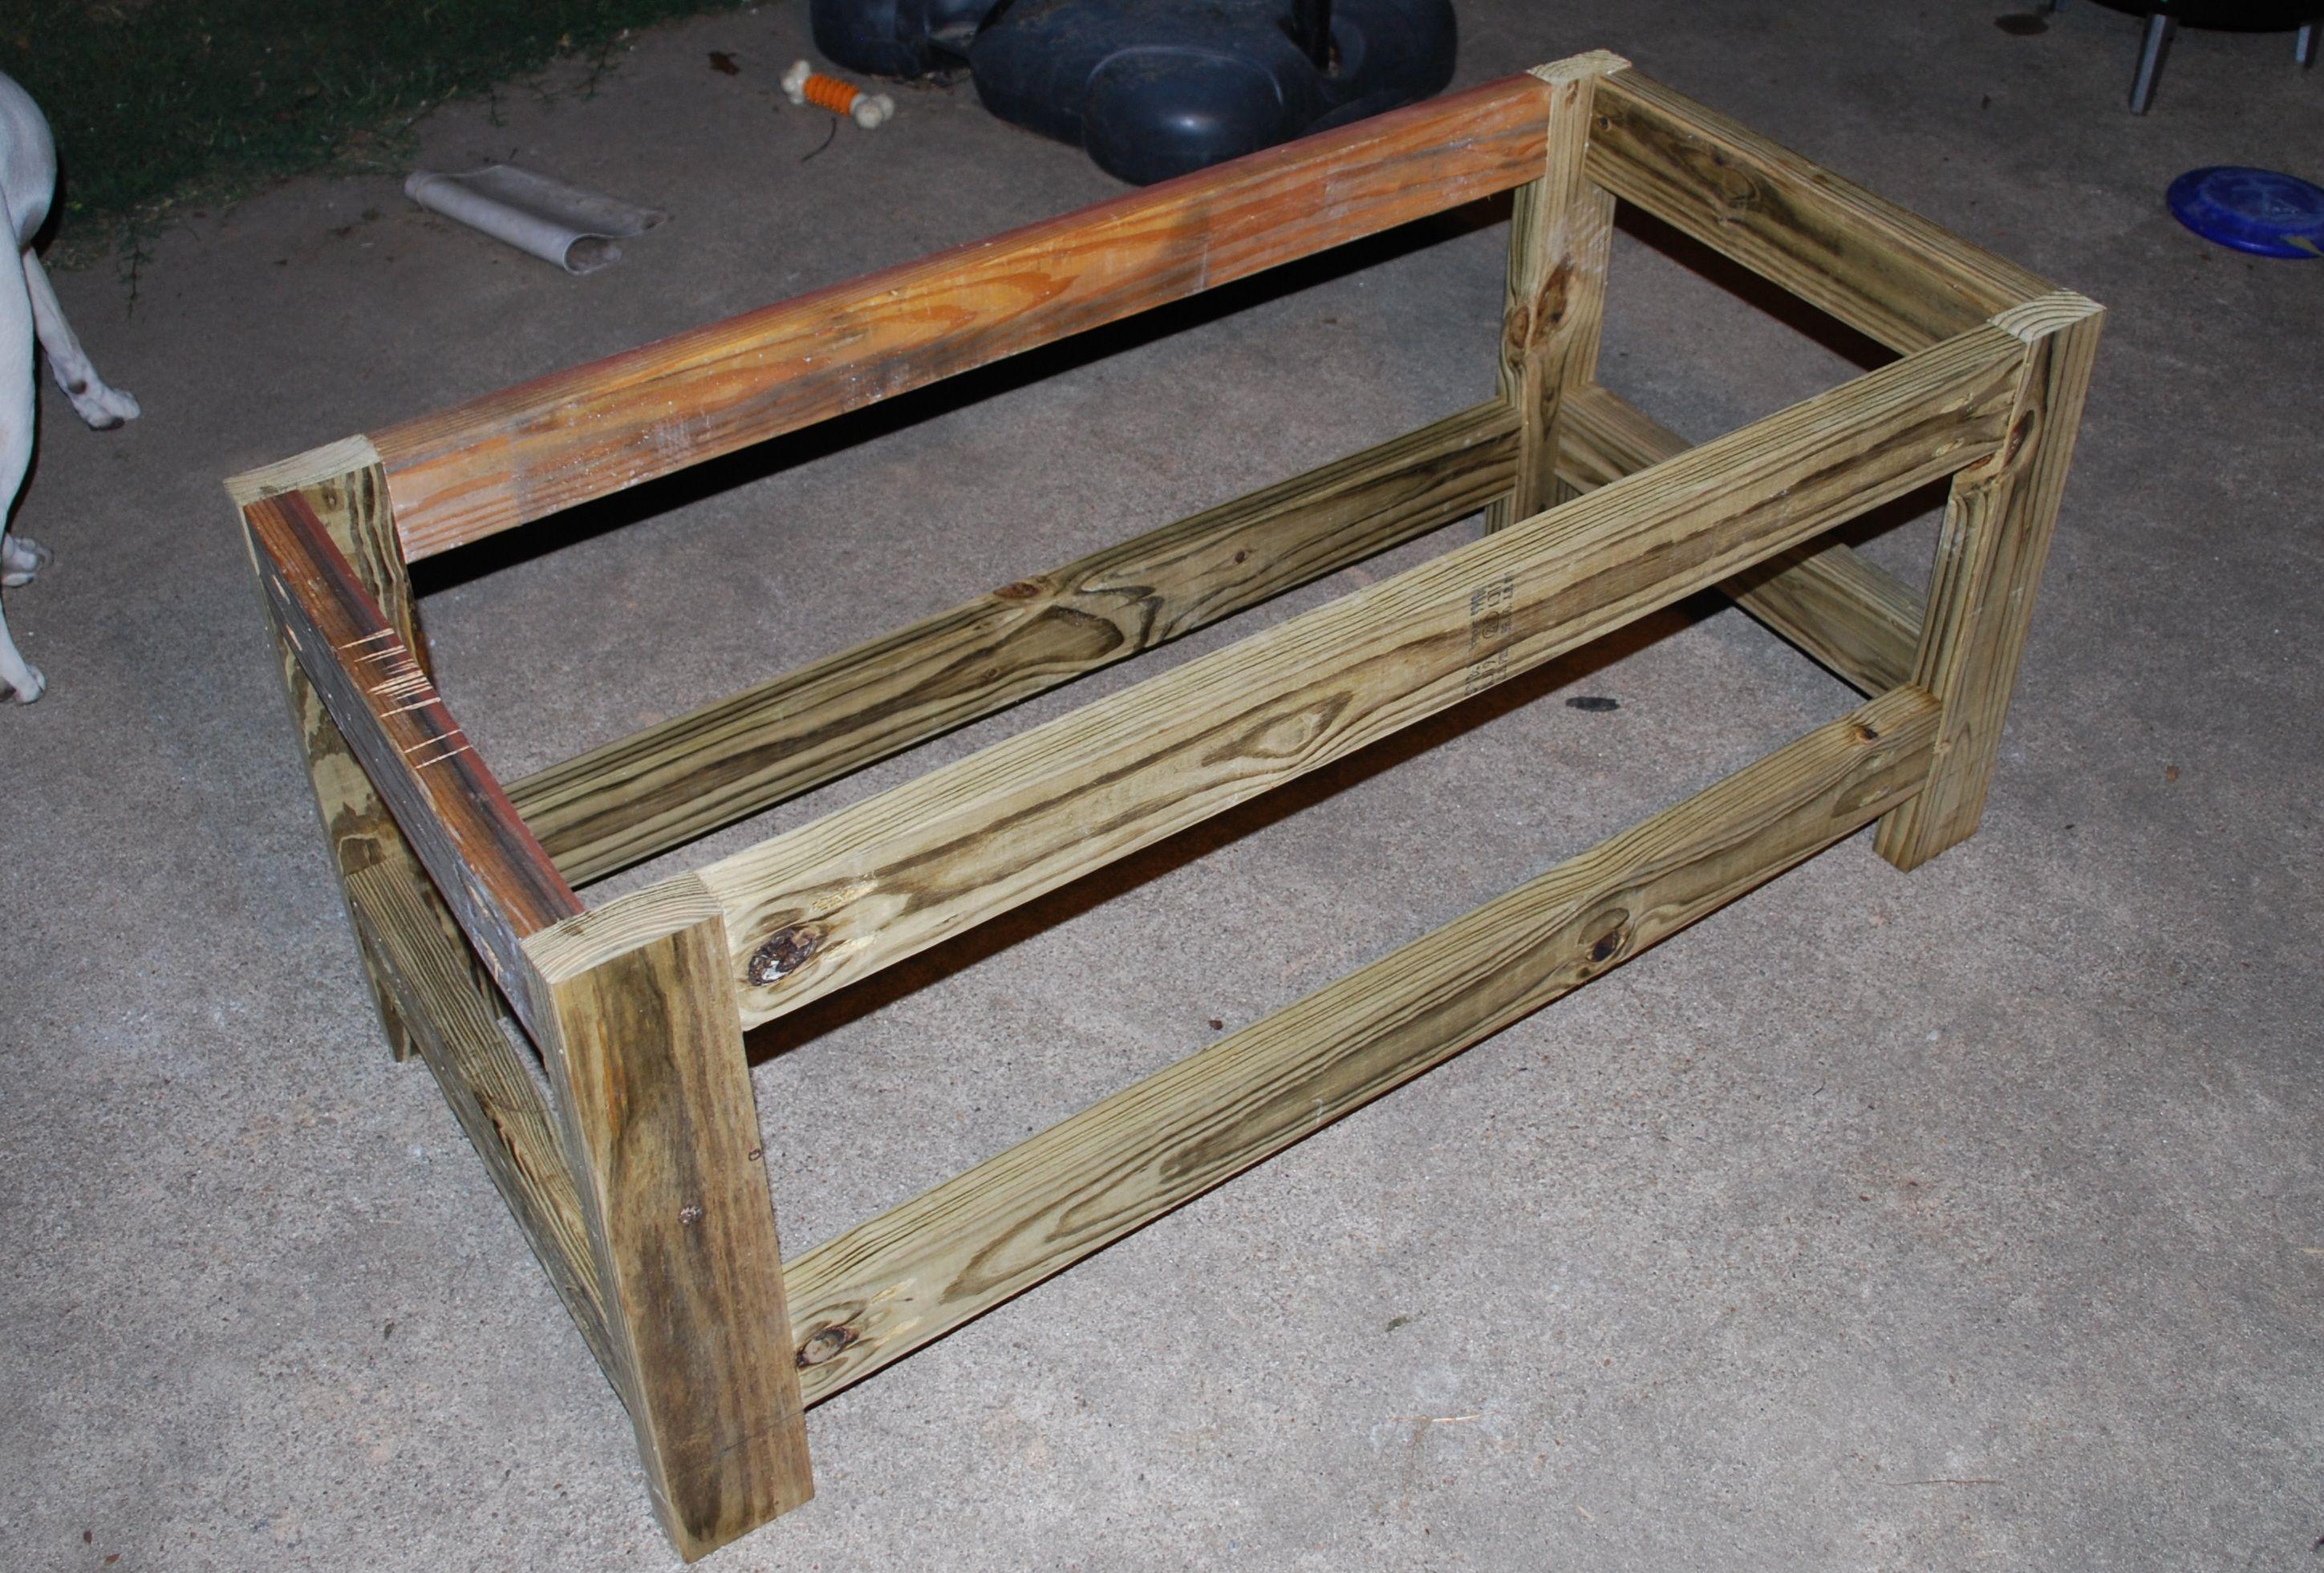 Garden storage bench plans Jun 8 2012 Free plans for 7